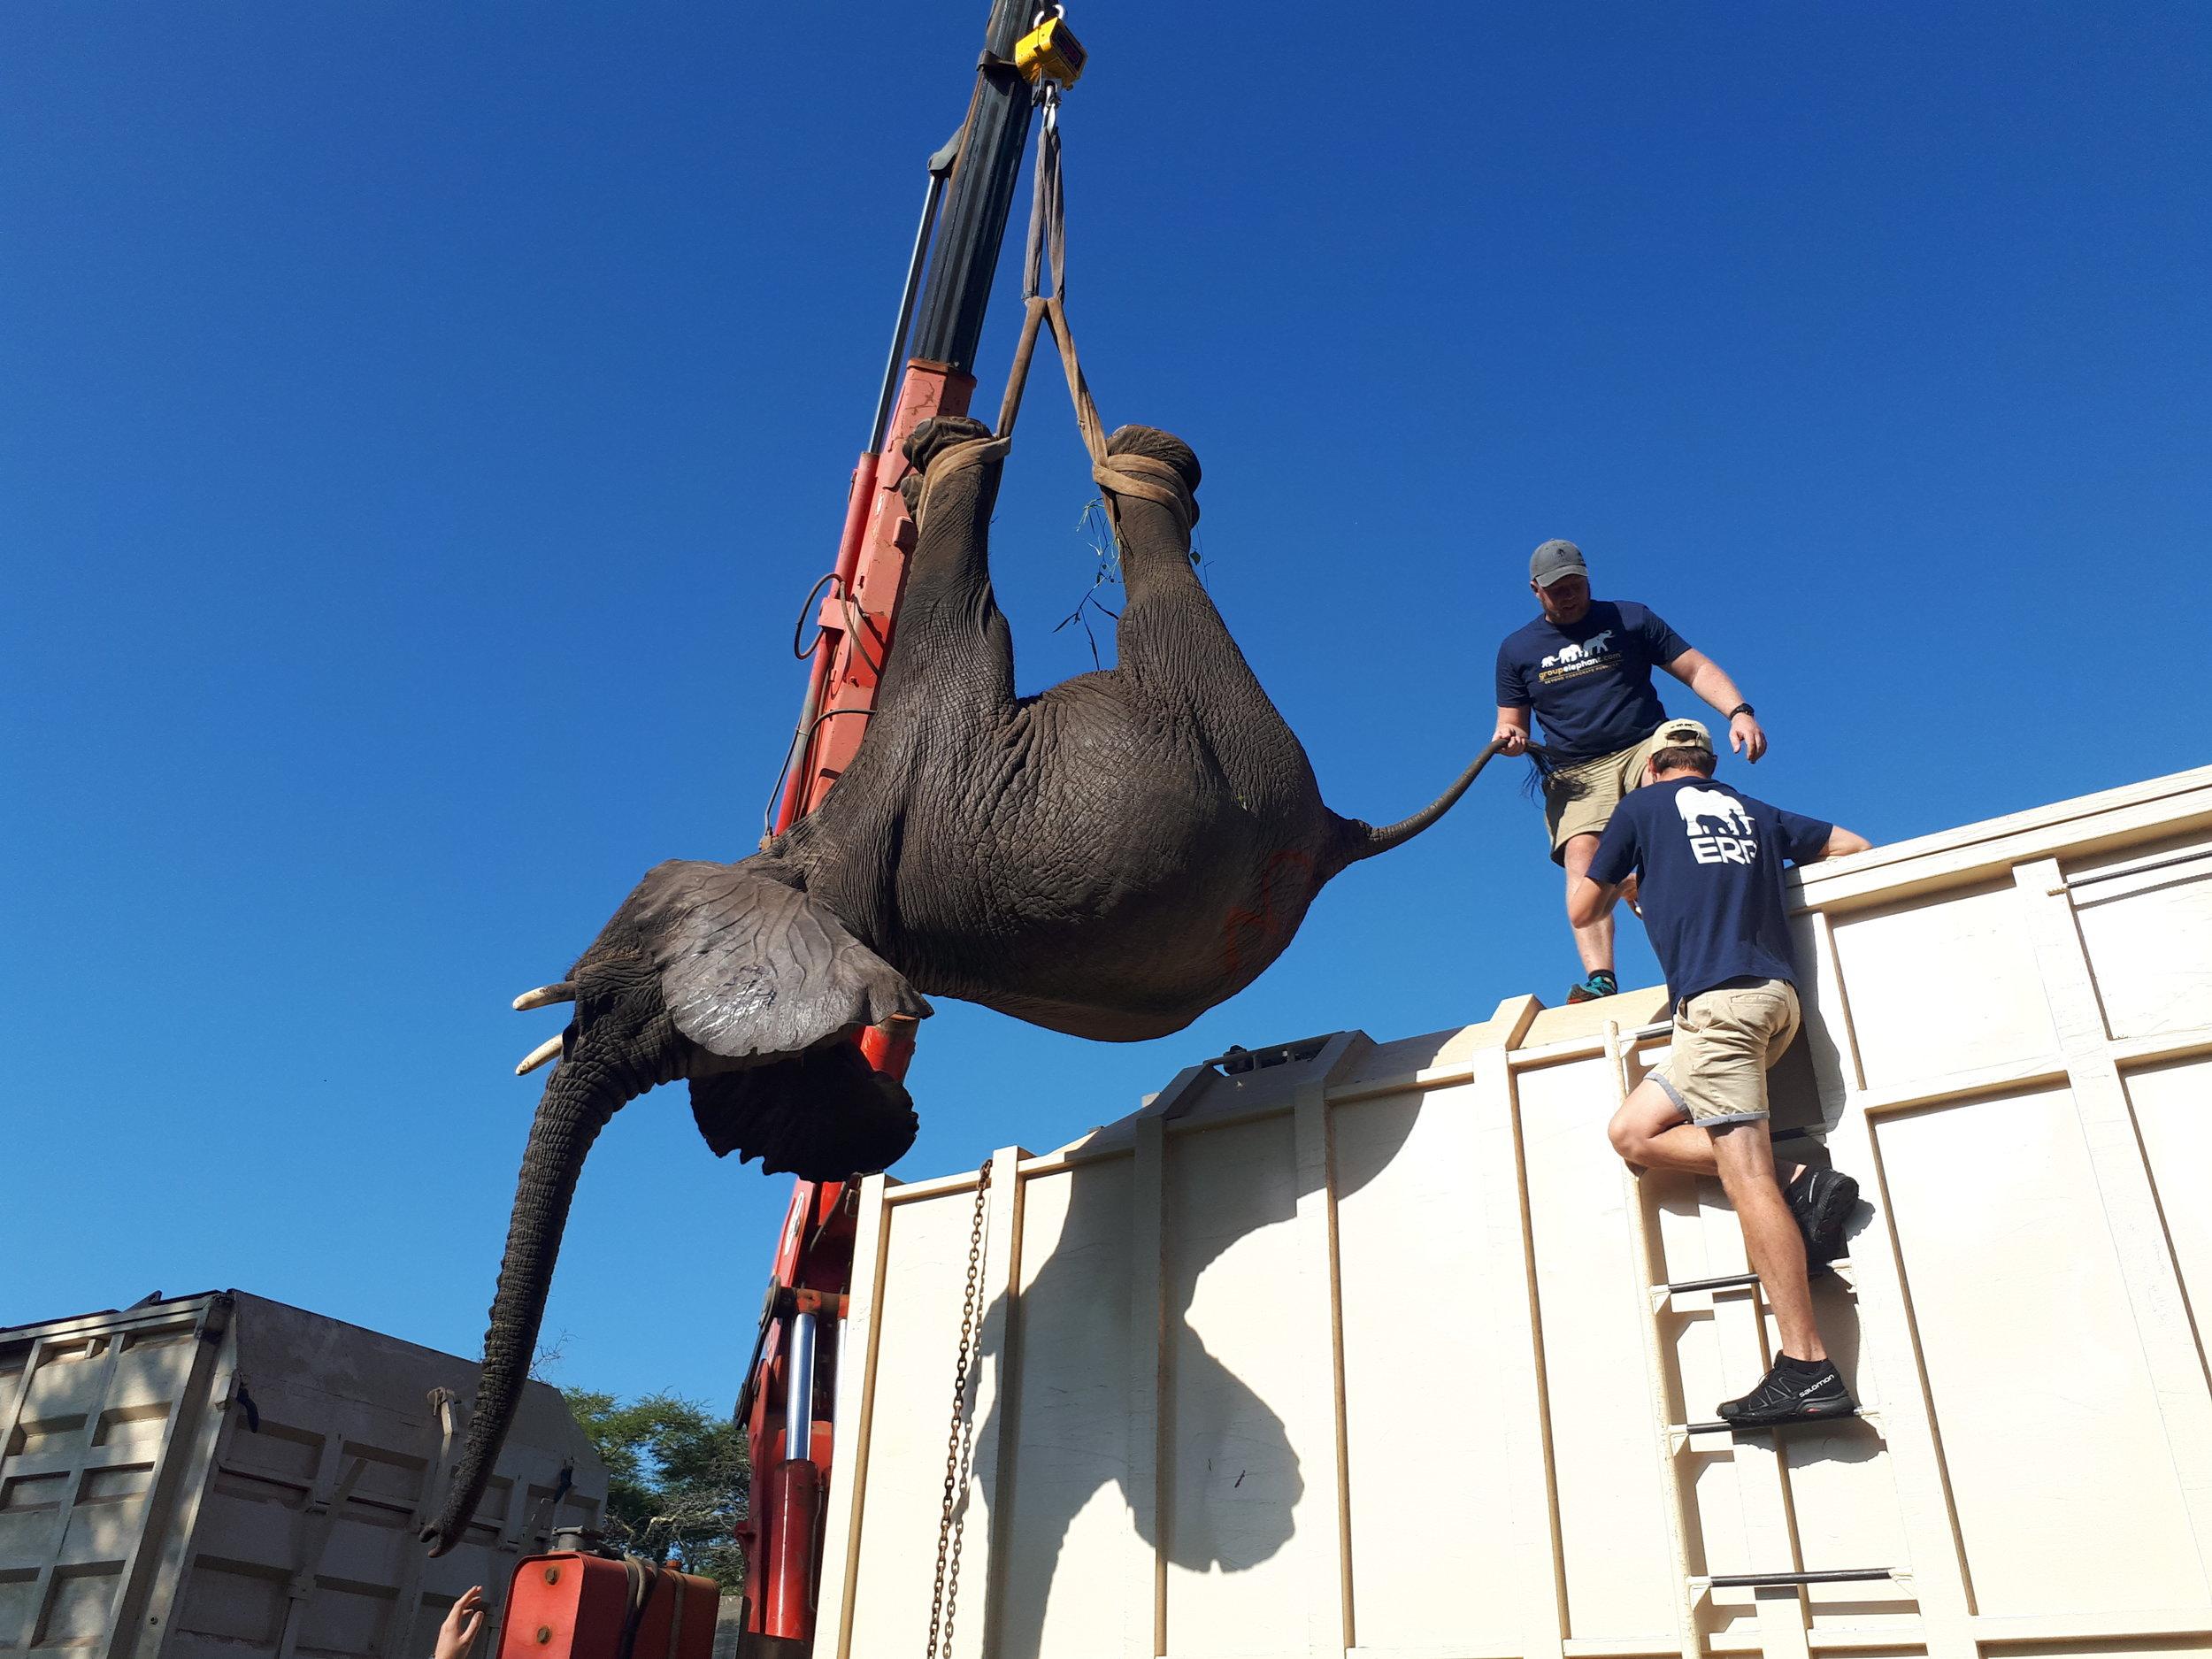 Transferring elephants onto the truck.